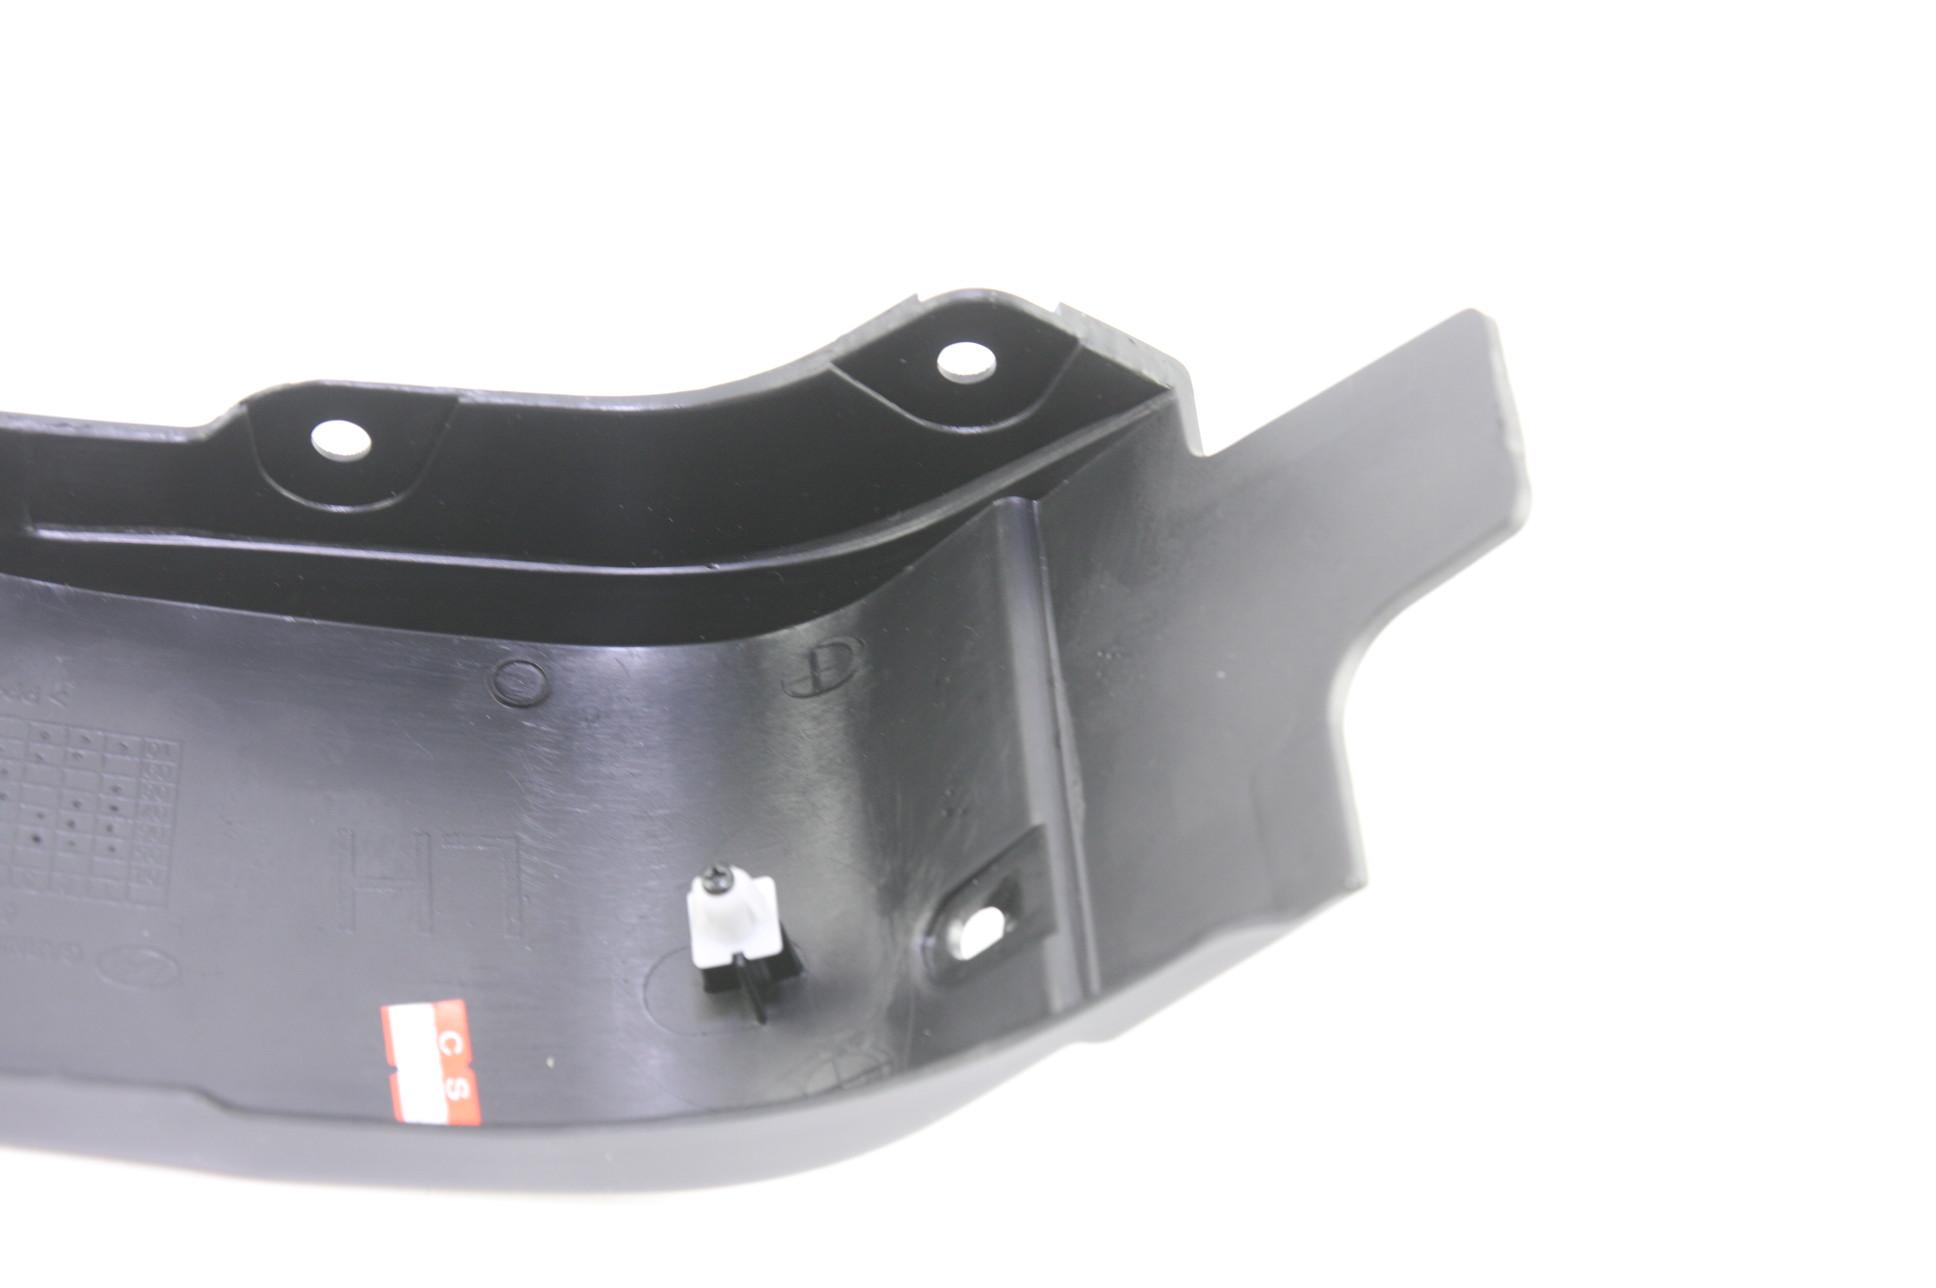 *~ New OEM Hyundai 8771126500 Front LH Exterior Fender Moulding 05-06 Santa Fe - image 8